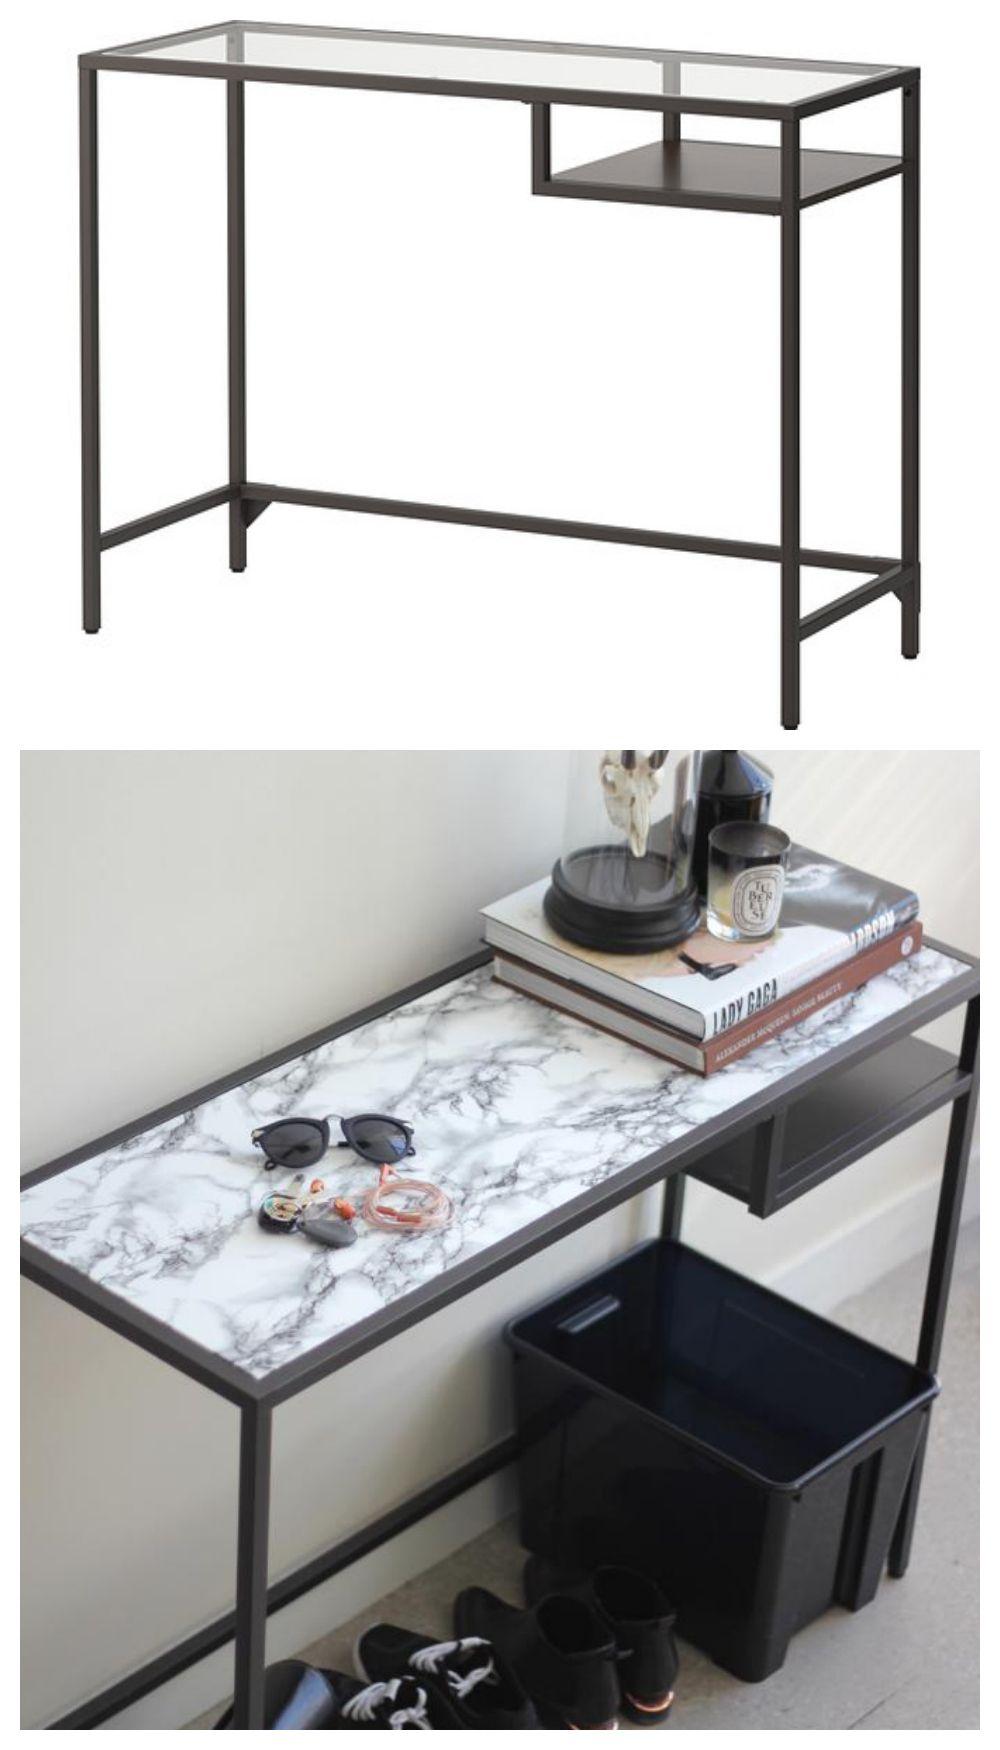 5 easy furniture makeovers that skip the paint decor idea pinterest m bel regal und deko. Black Bedroom Furniture Sets. Home Design Ideas